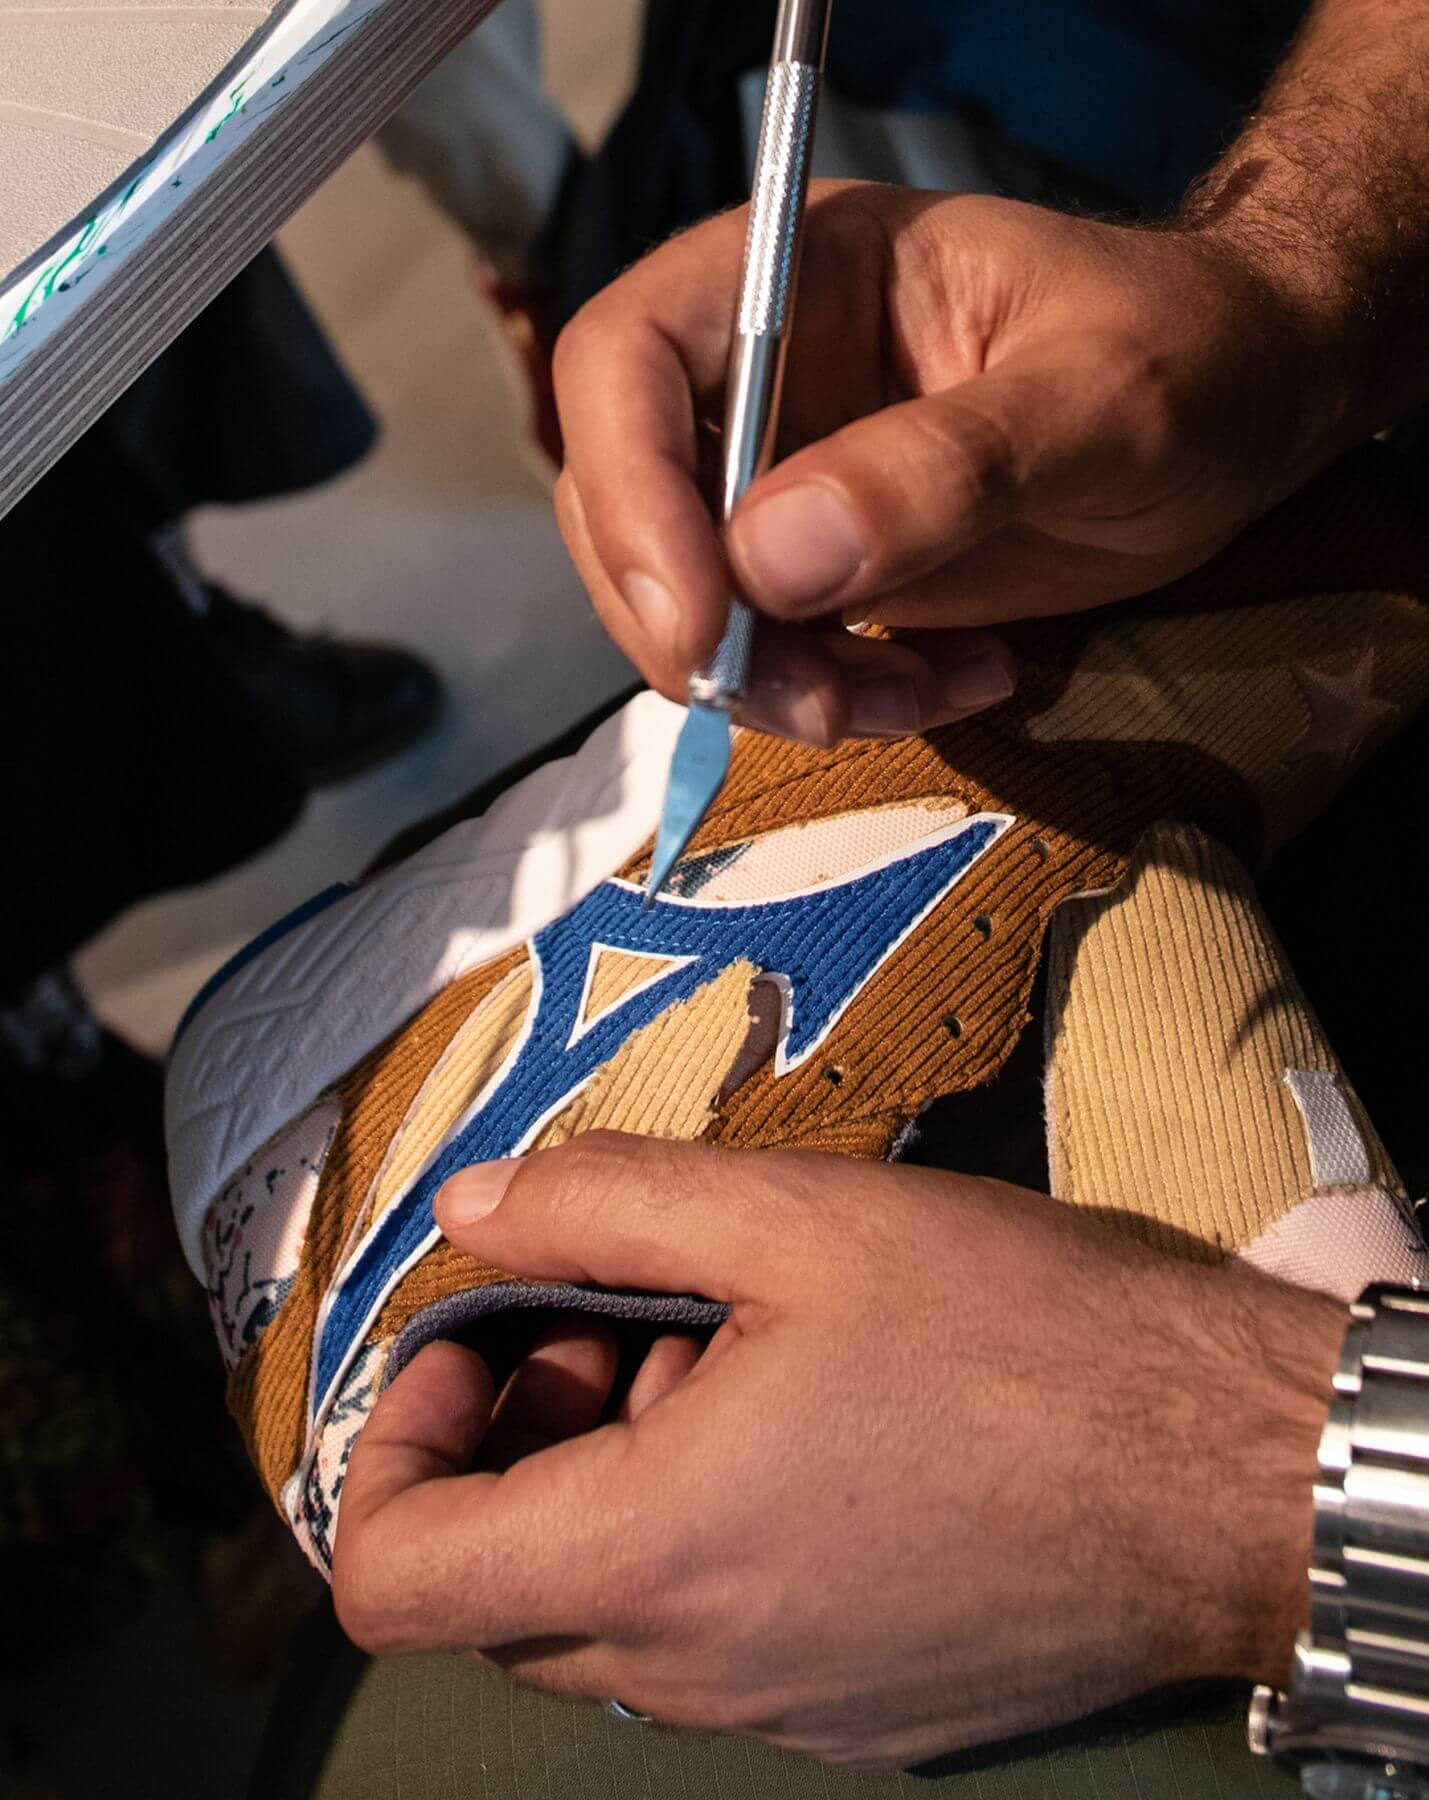 sneaker customizing - close-up scalpel